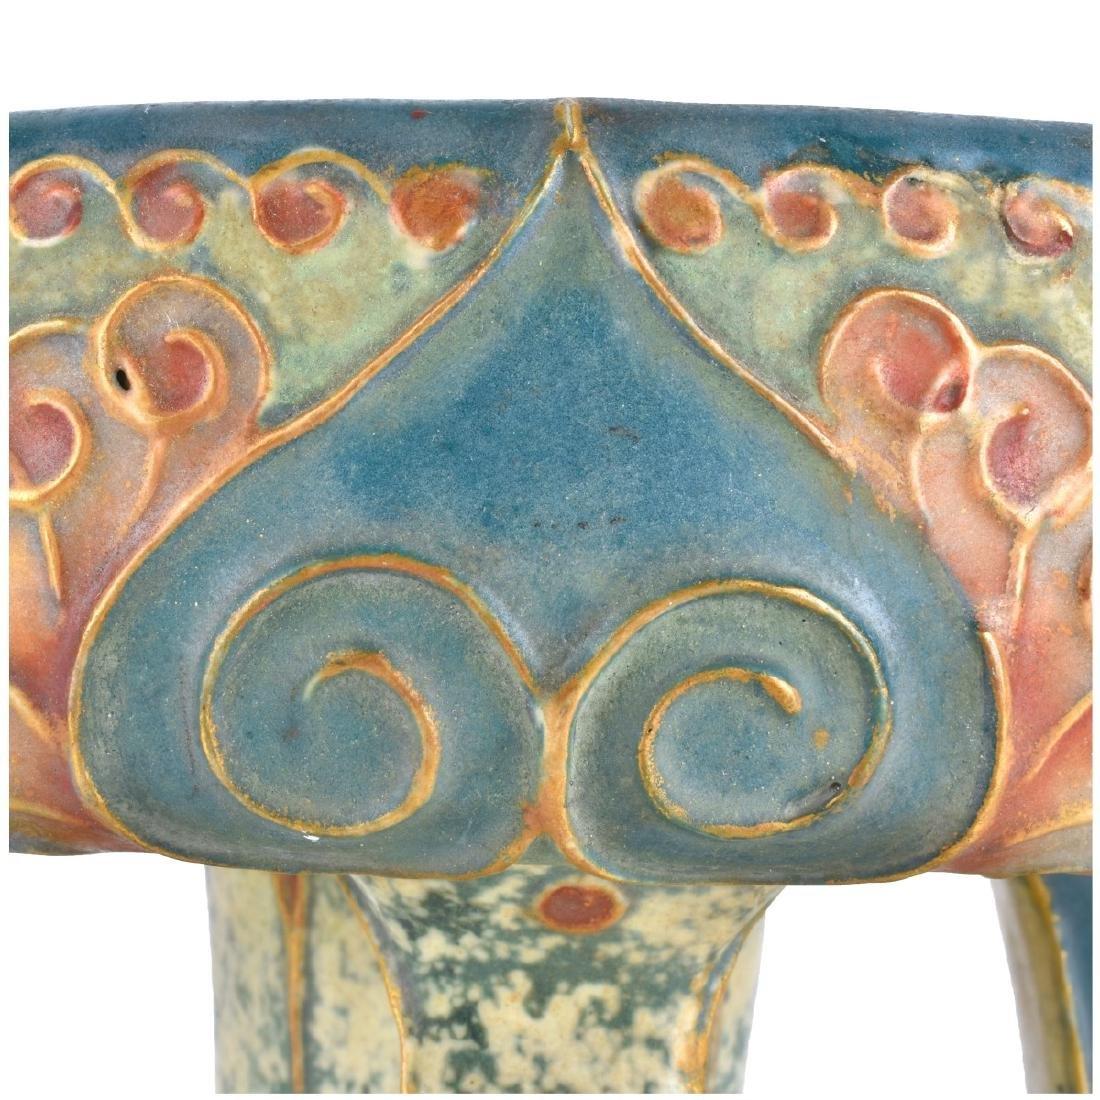 Amphora Turn Teplitz Gres Pottery Compote - 4